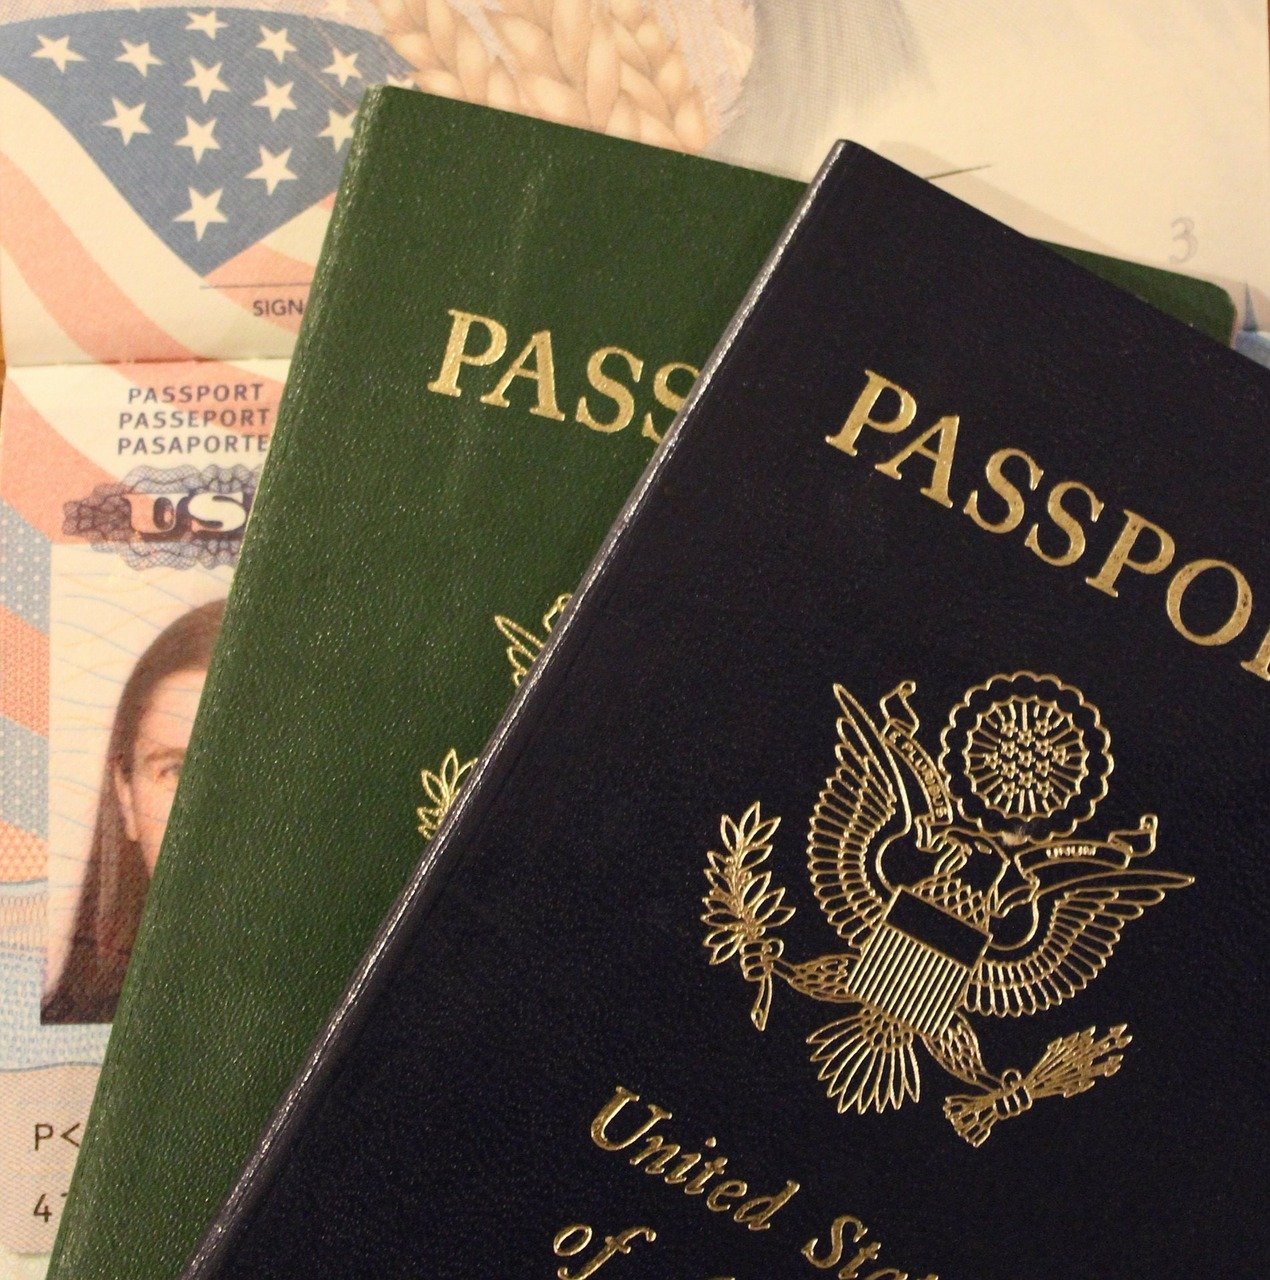 Zakon o državljanstvu – kako pridobiti slovensko državljanstvo?